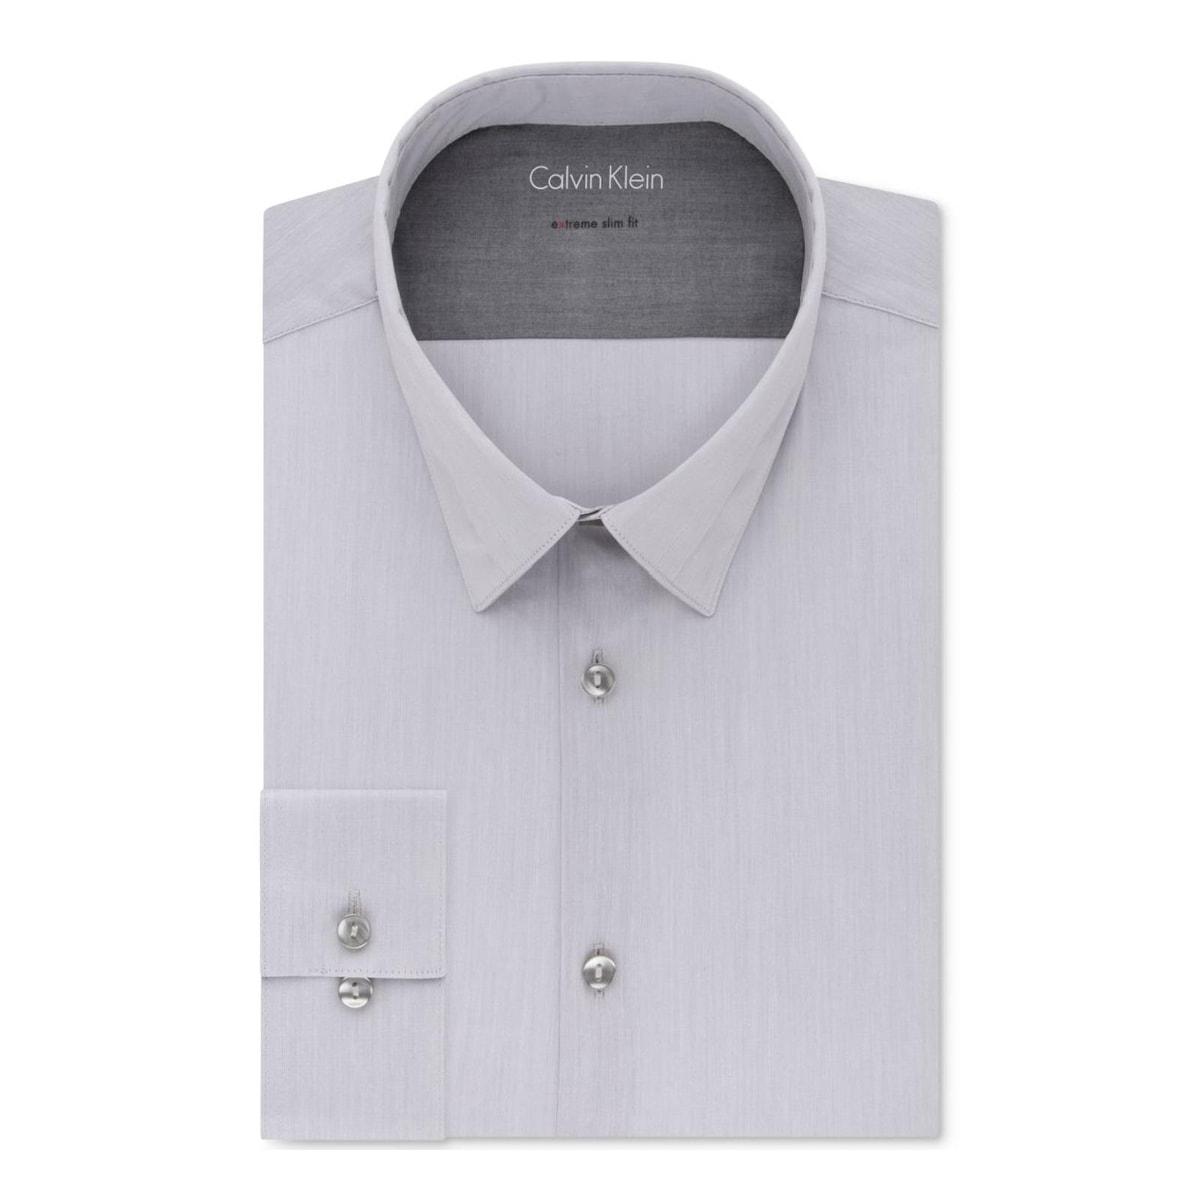 Shop Calvin Klein Mens Dress Shirt Slim Fit Button Down 16 165 34